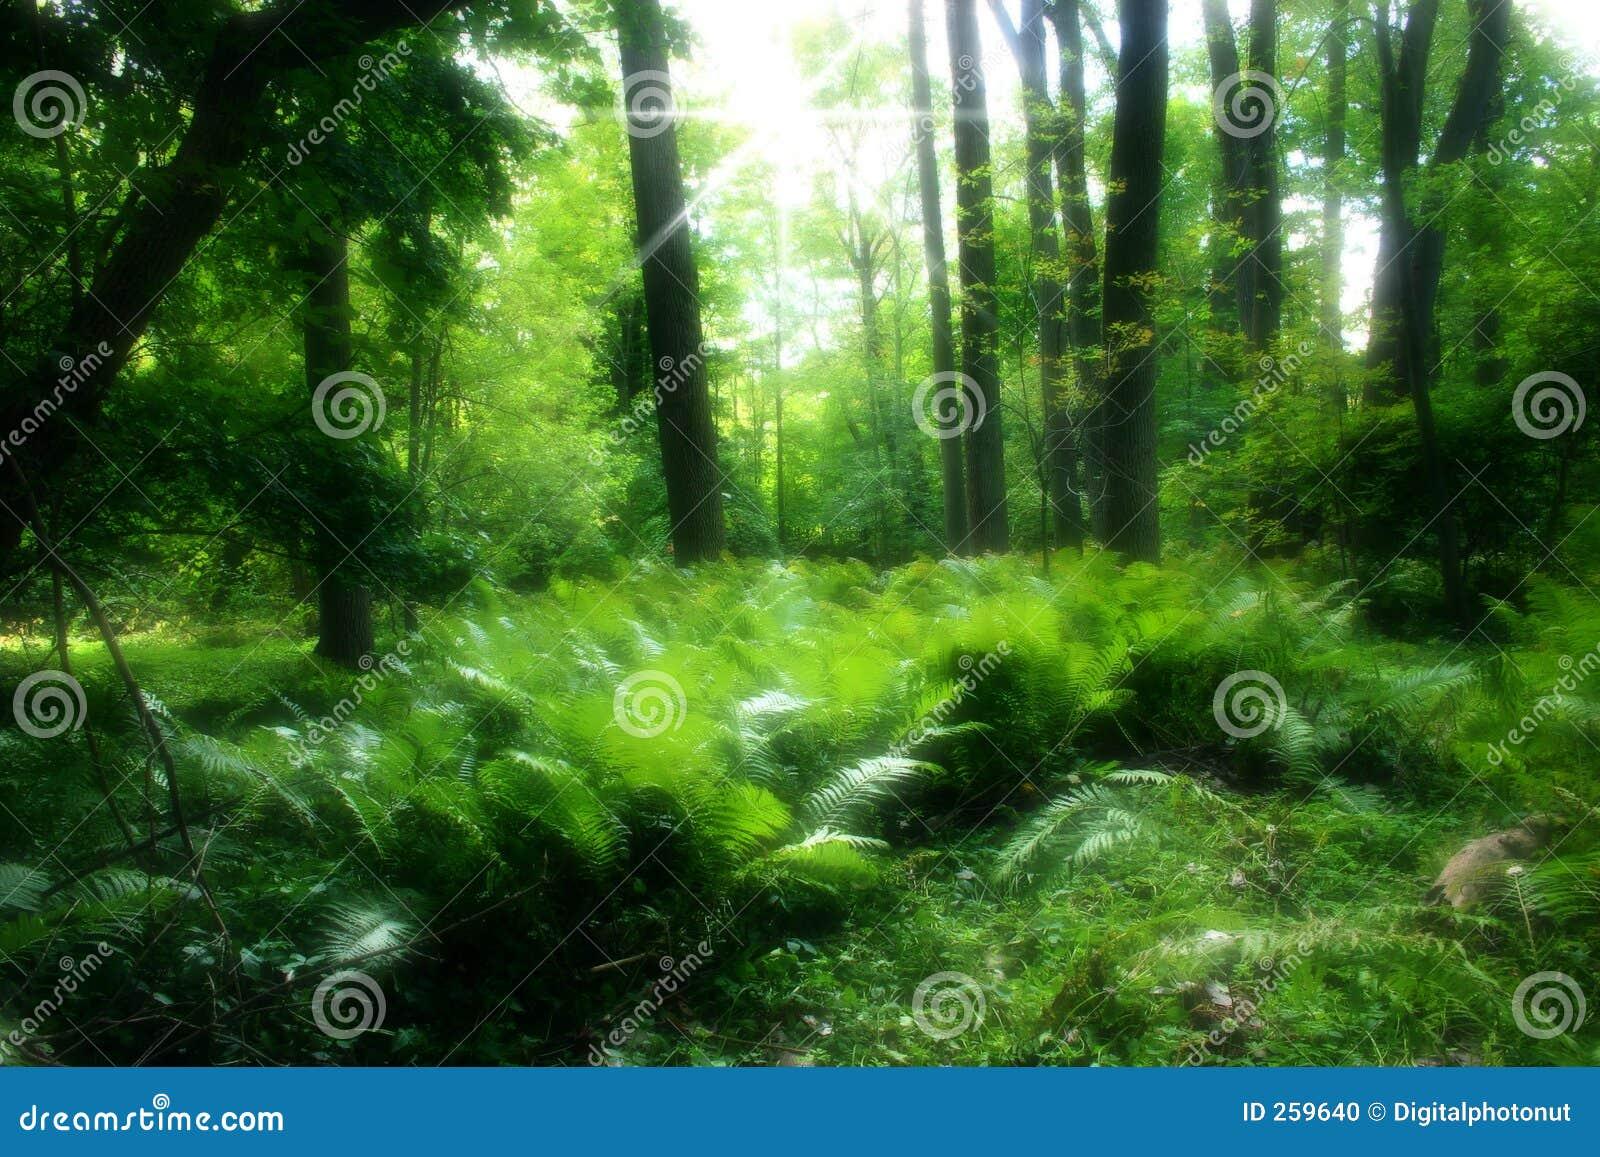 Forêt verte abondante